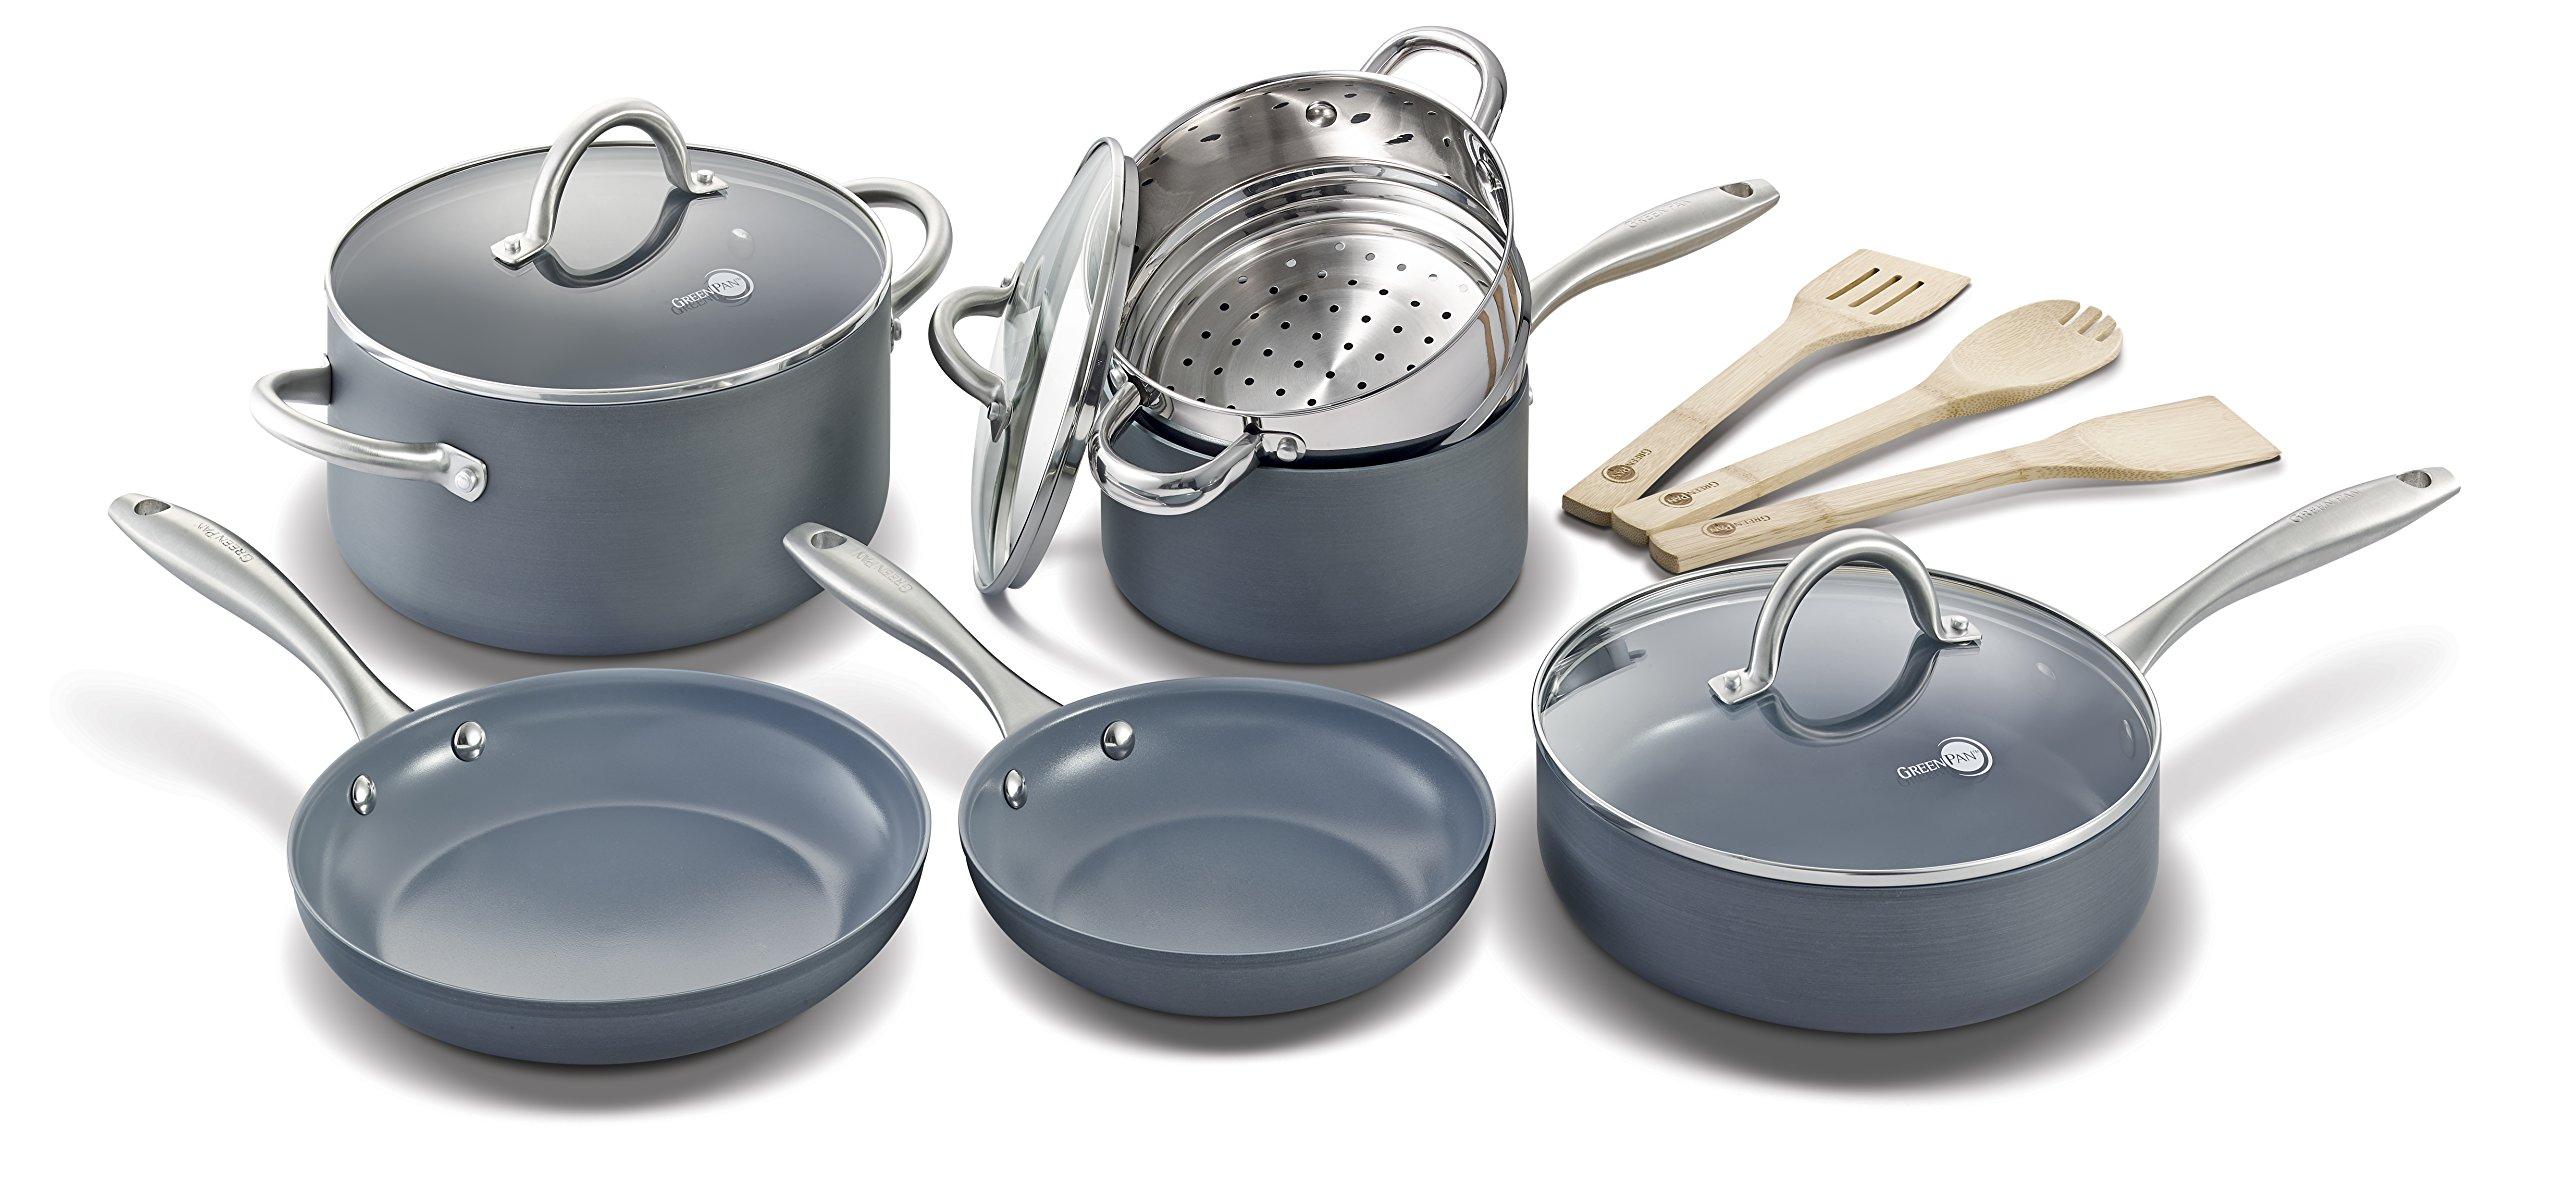 6a62c6ab7b41 GreenPan Lima 12pc Ceramic Non-Stick Cookware Set 885837010091 | eBay